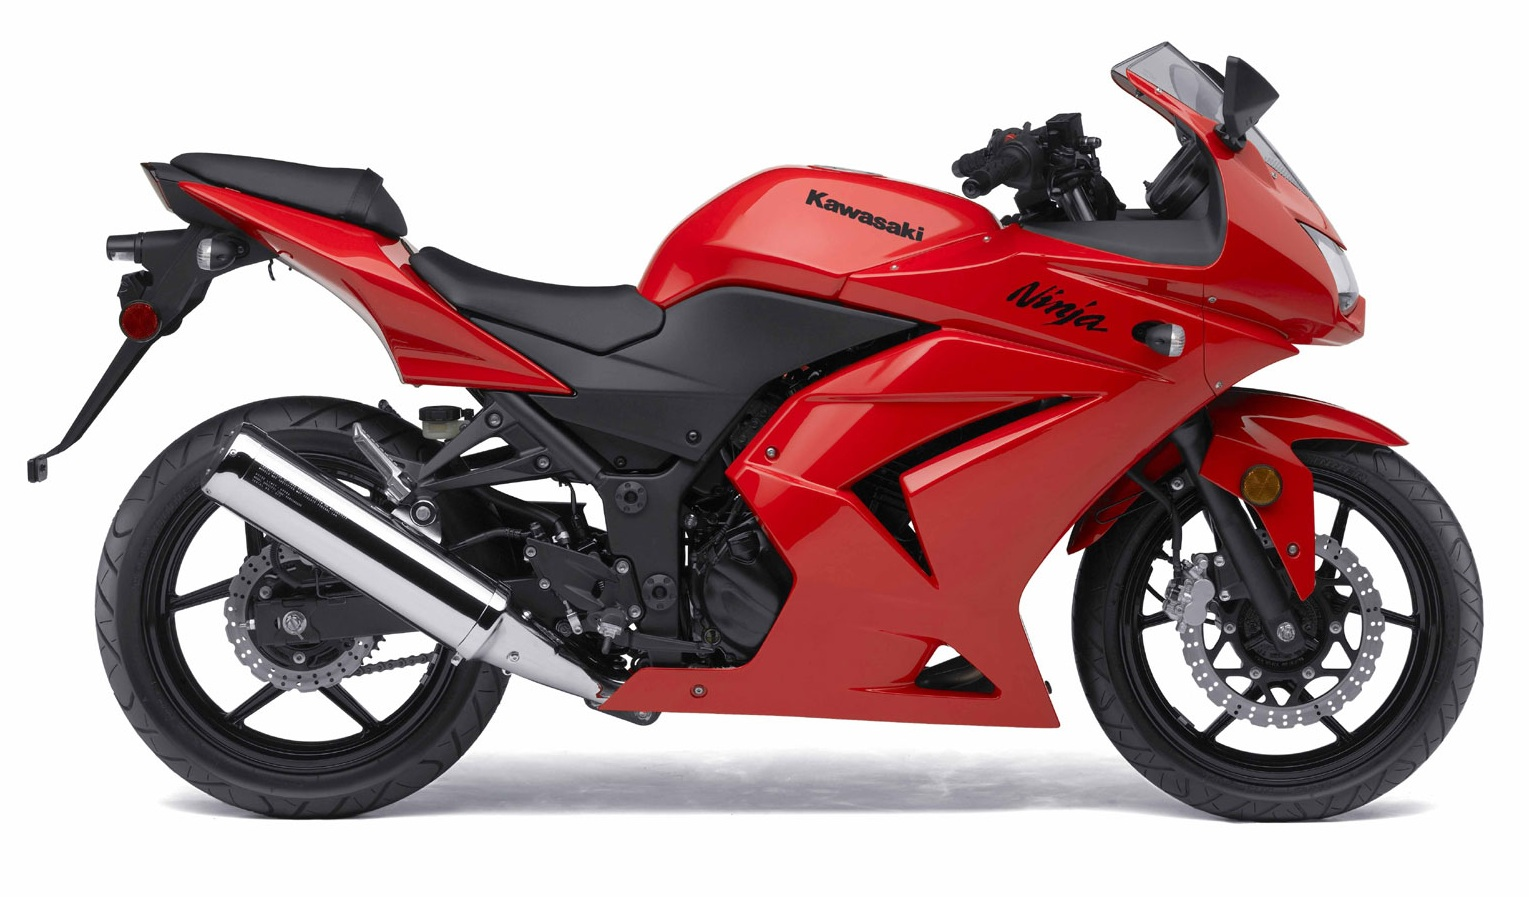 Kawasaki Ninja 150 Rr Reviews Price Specifications Mileage